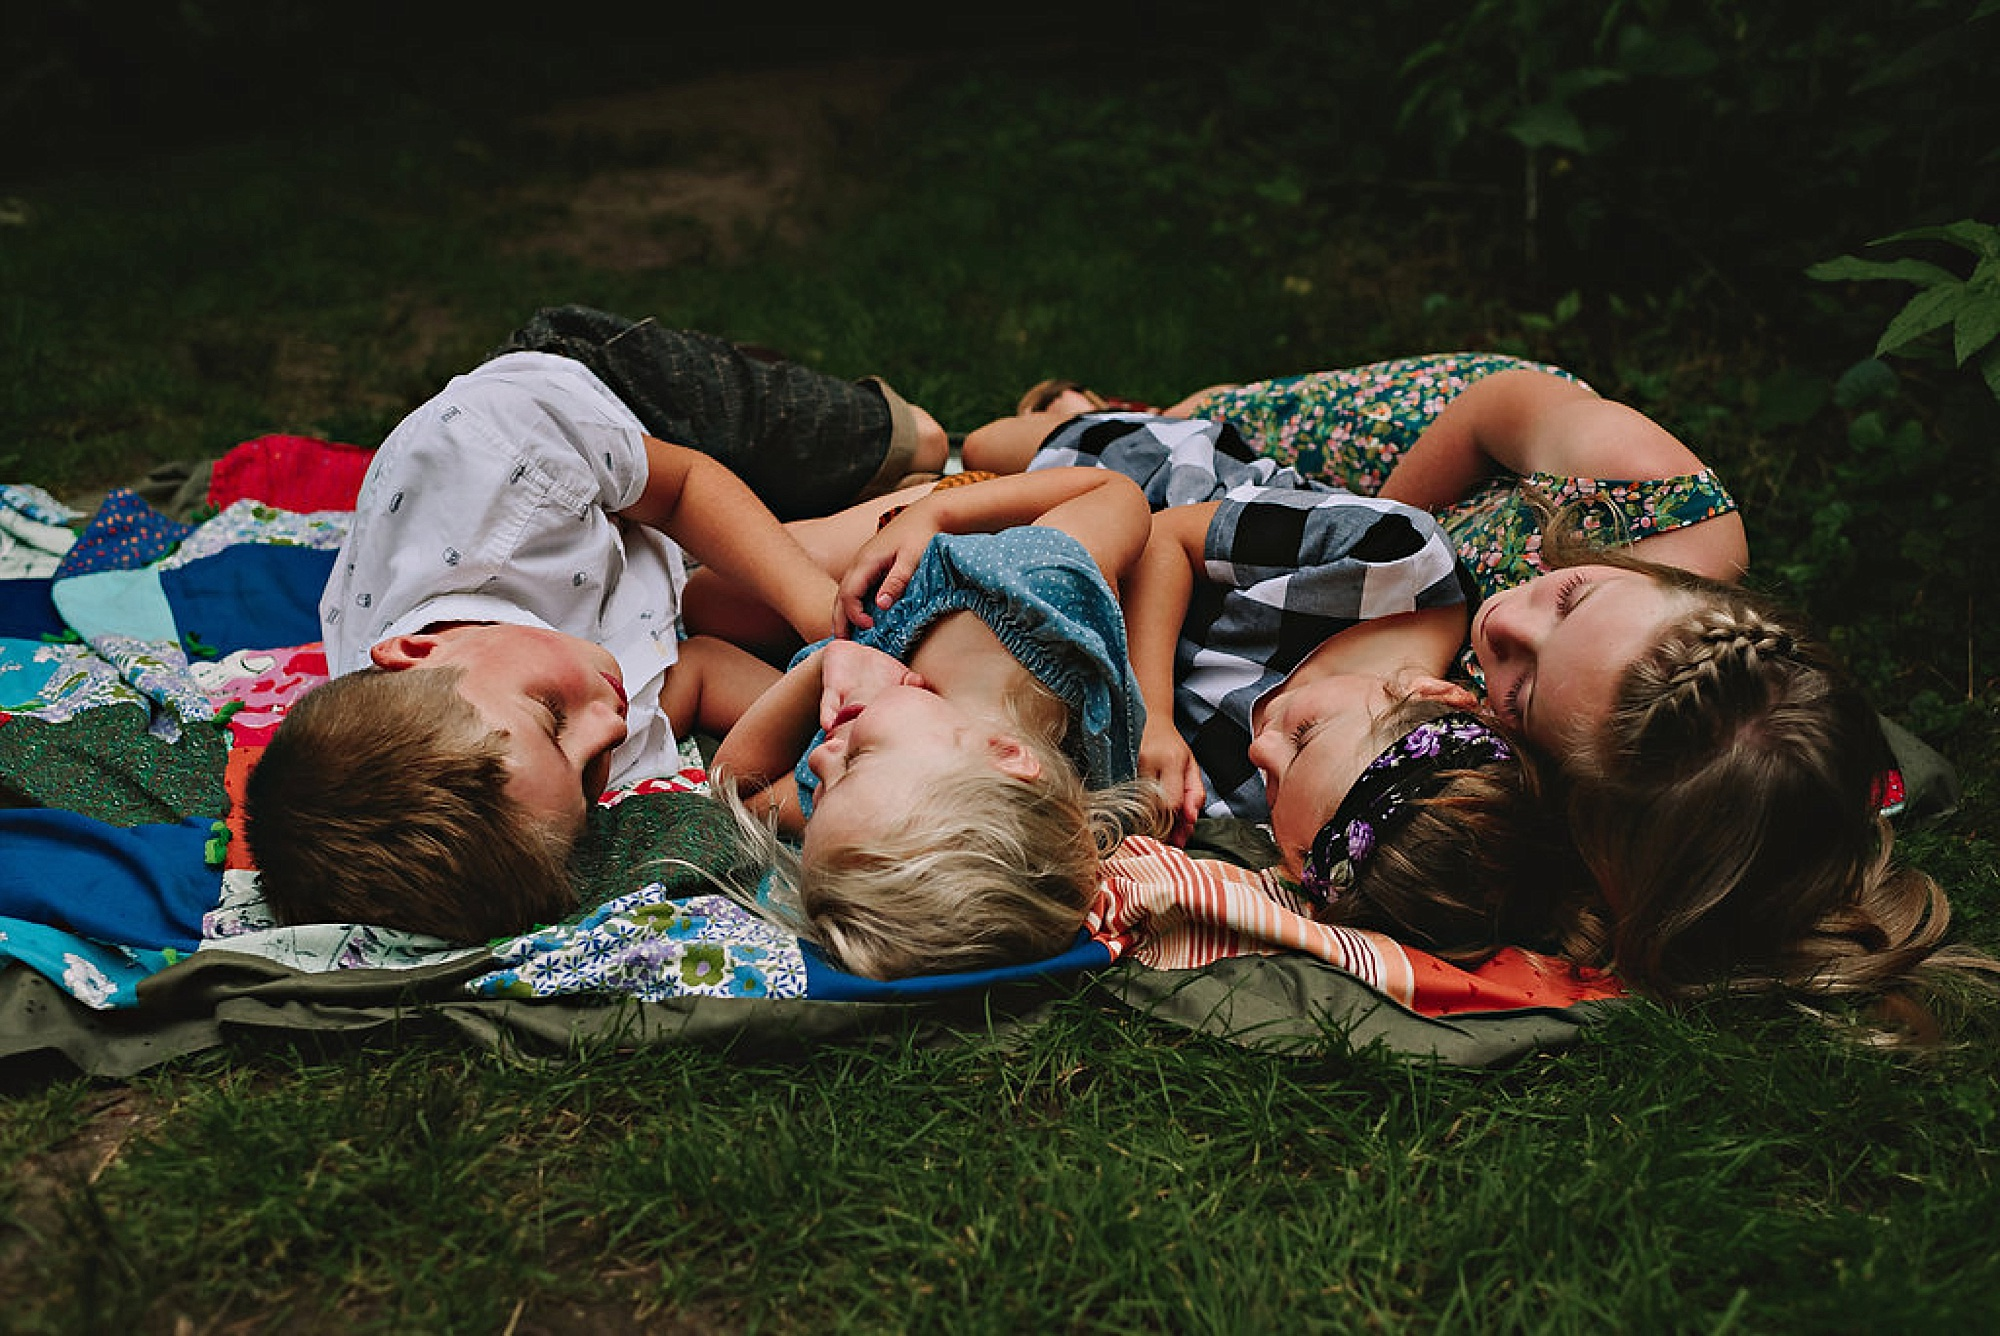 bandy-family-lauren-grayson-akron-ohio_0032.jpg